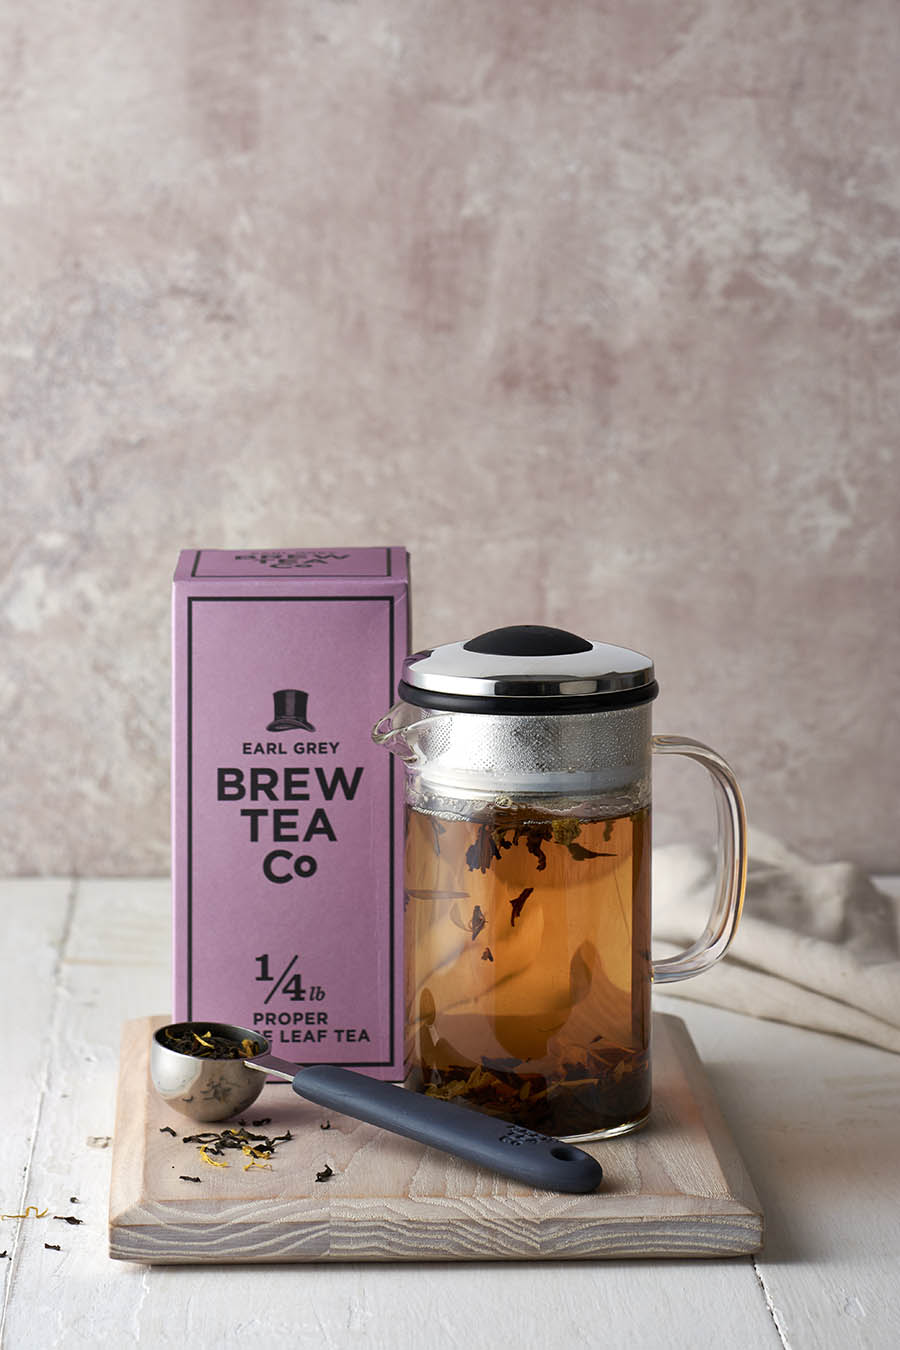 brew tea co earl grey drink photography